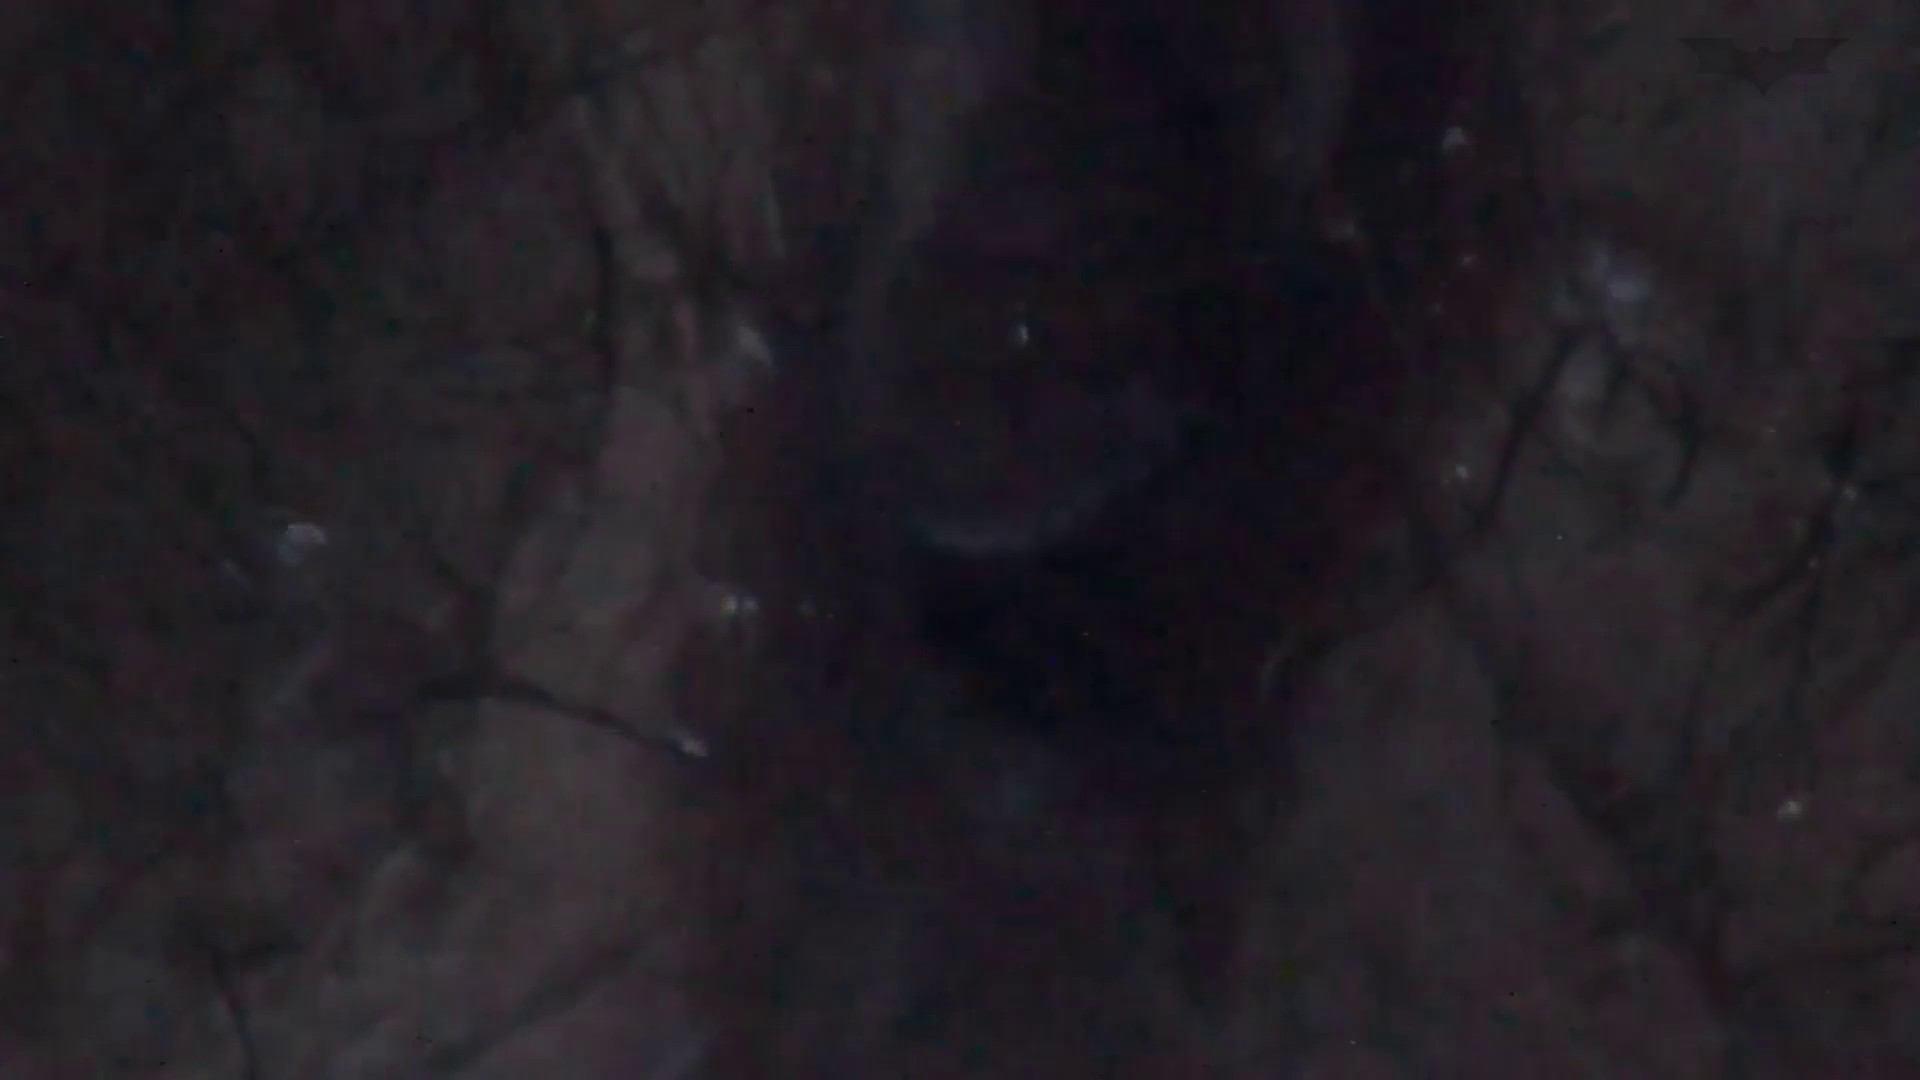 JD盗撮 美女の洗面所の秘密 Vol.64 細身女性 ワレメ動画紹介 81画像 39